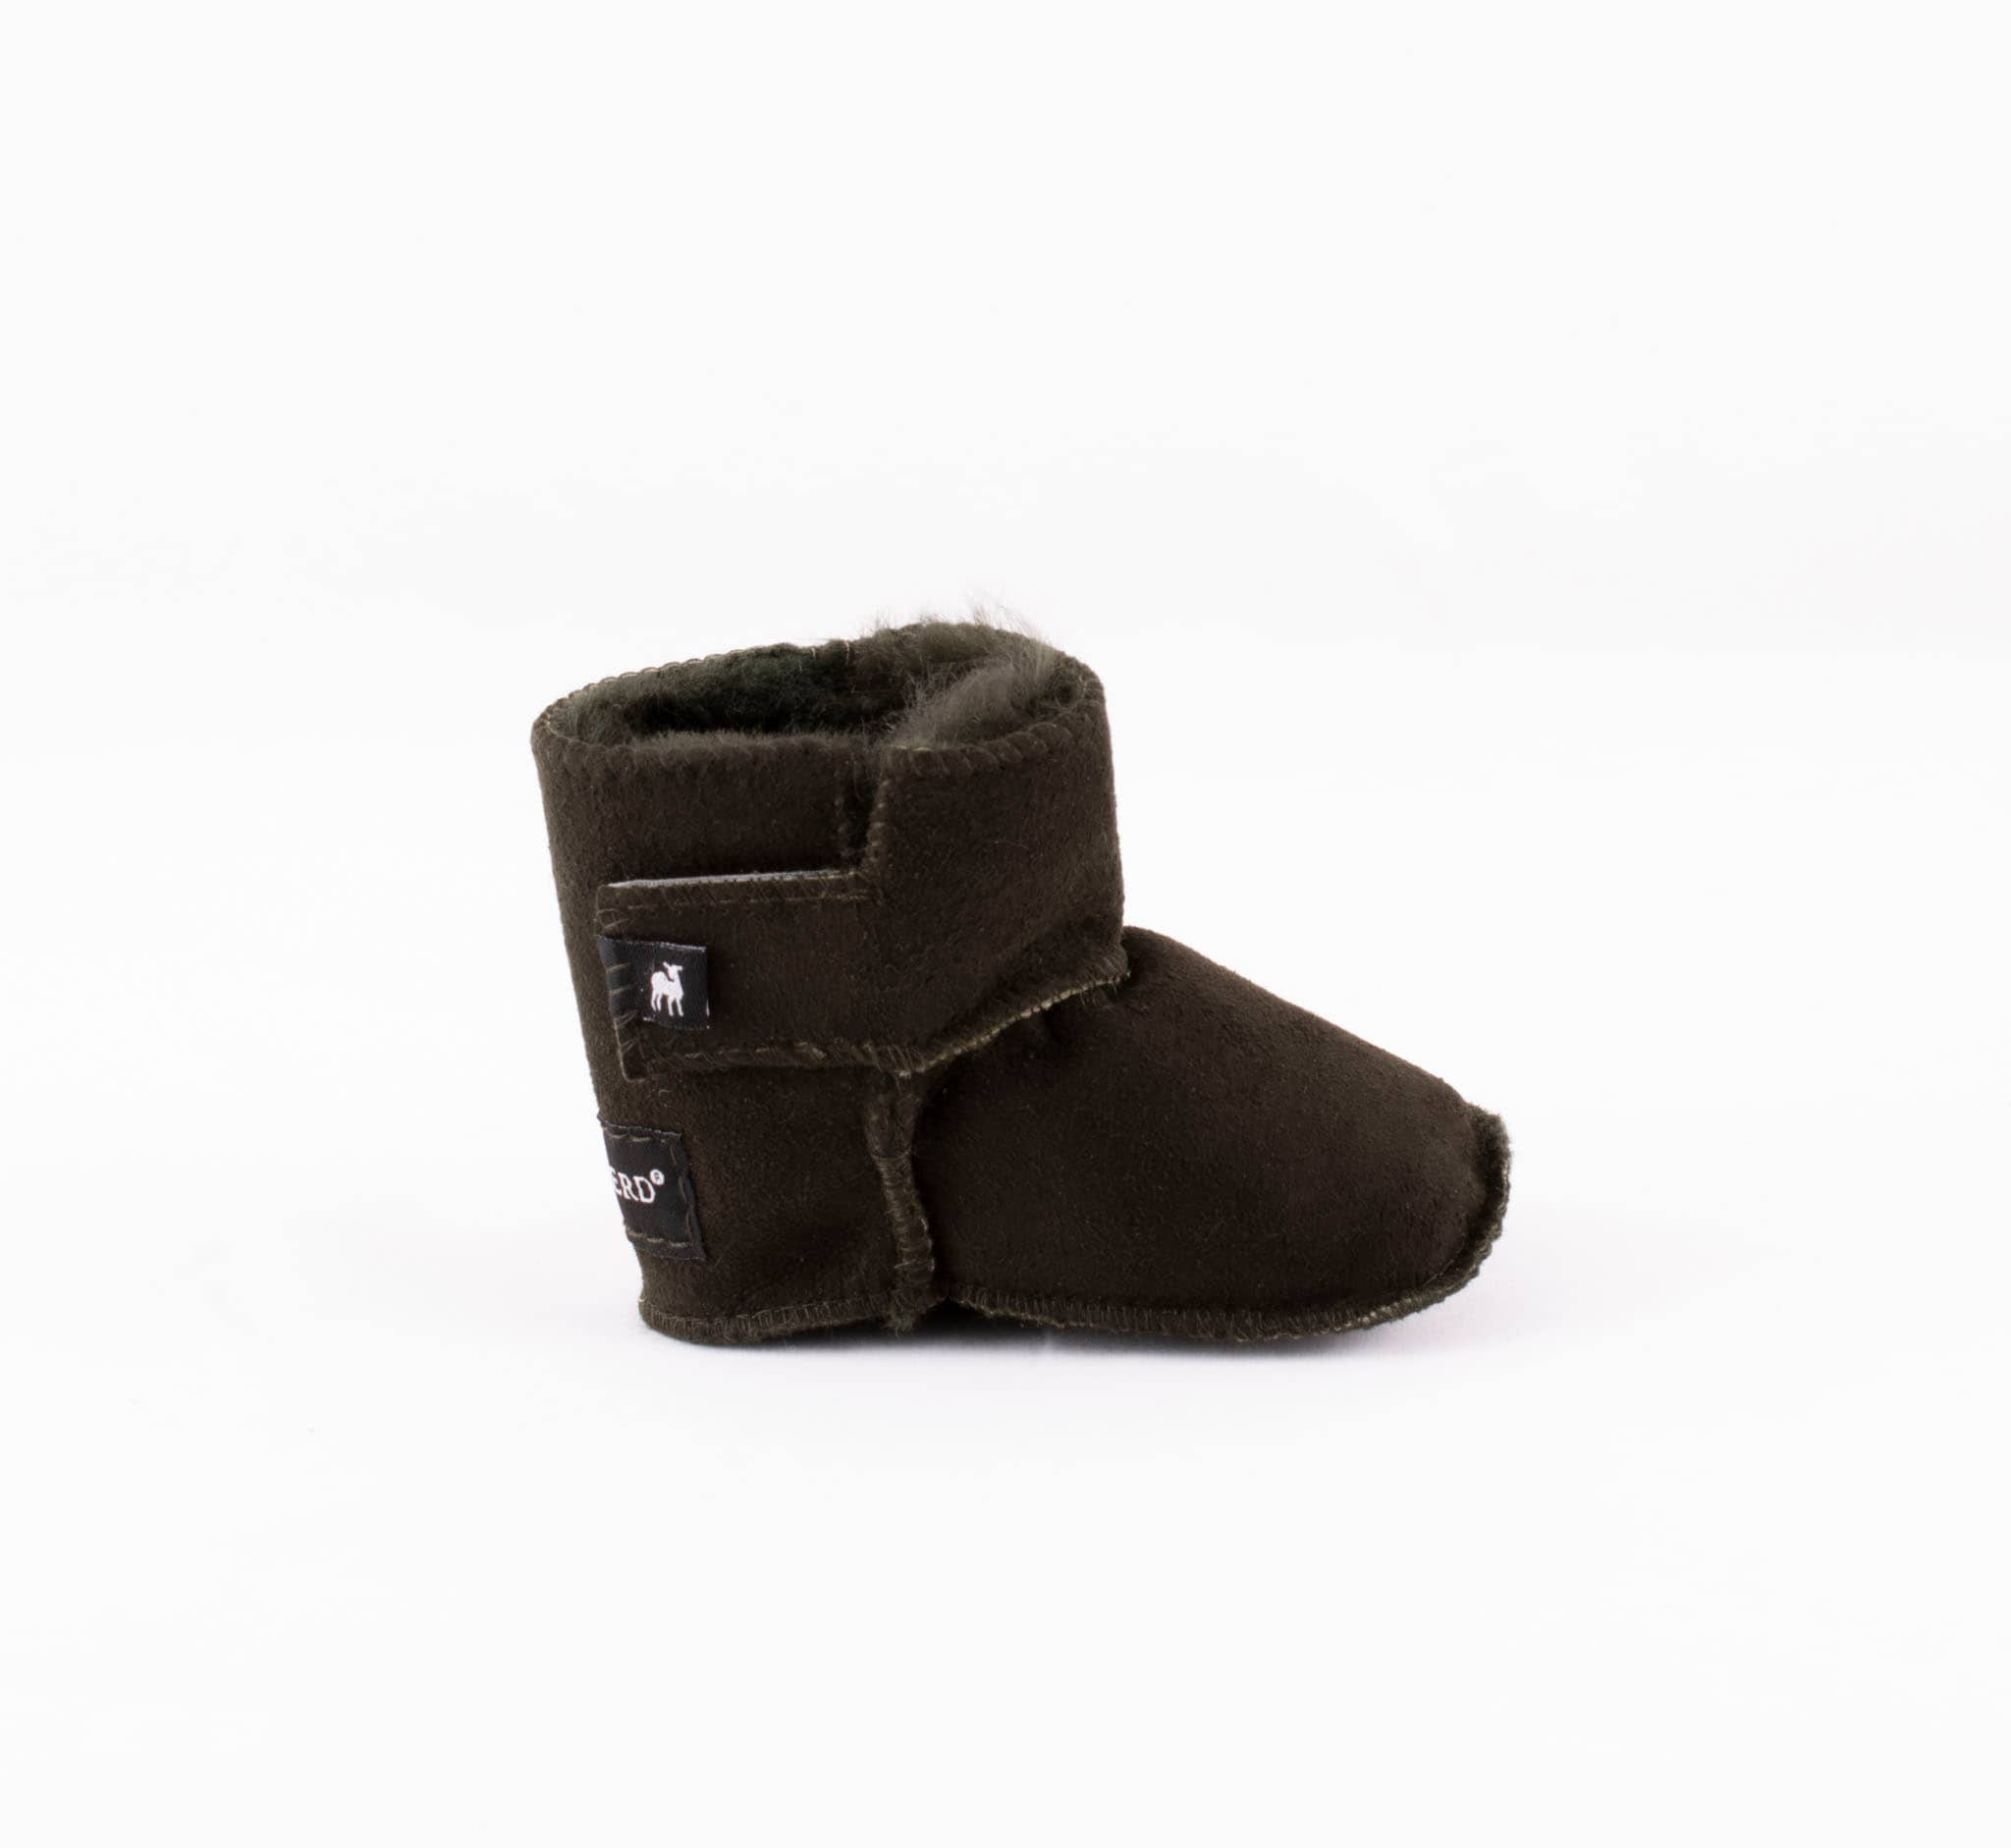 Borås baby slippers Olive